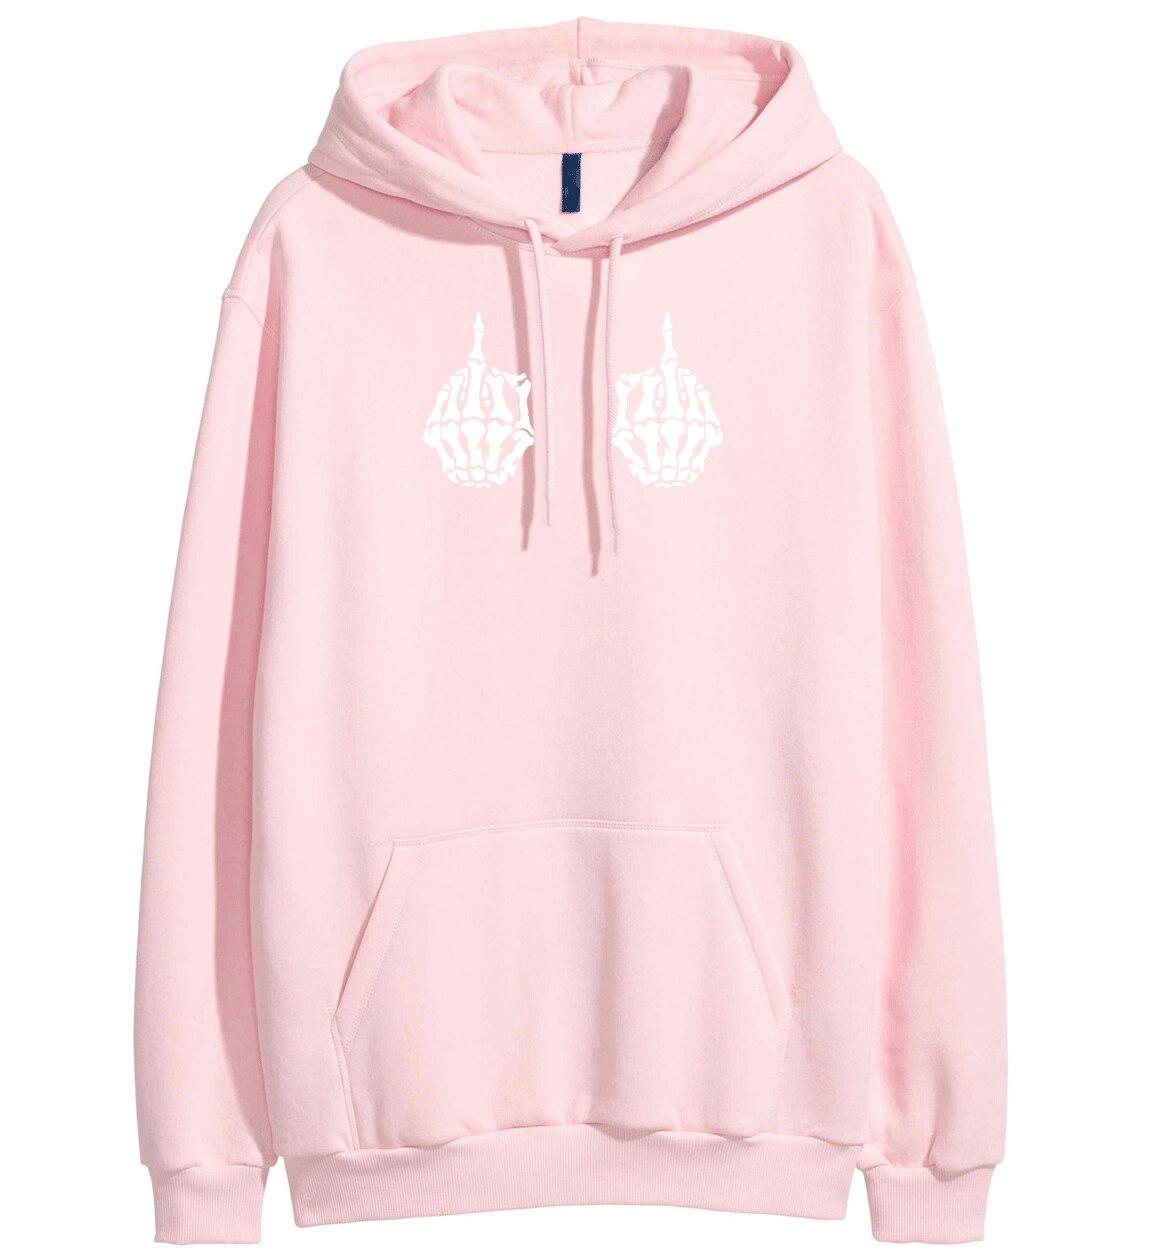 Both Skeleton Hand Print Hip Hop Hoodies For Women 2019 Spring Winter Fleece Sweatshirt Kpop Clothes Pullover Female Tracksuit